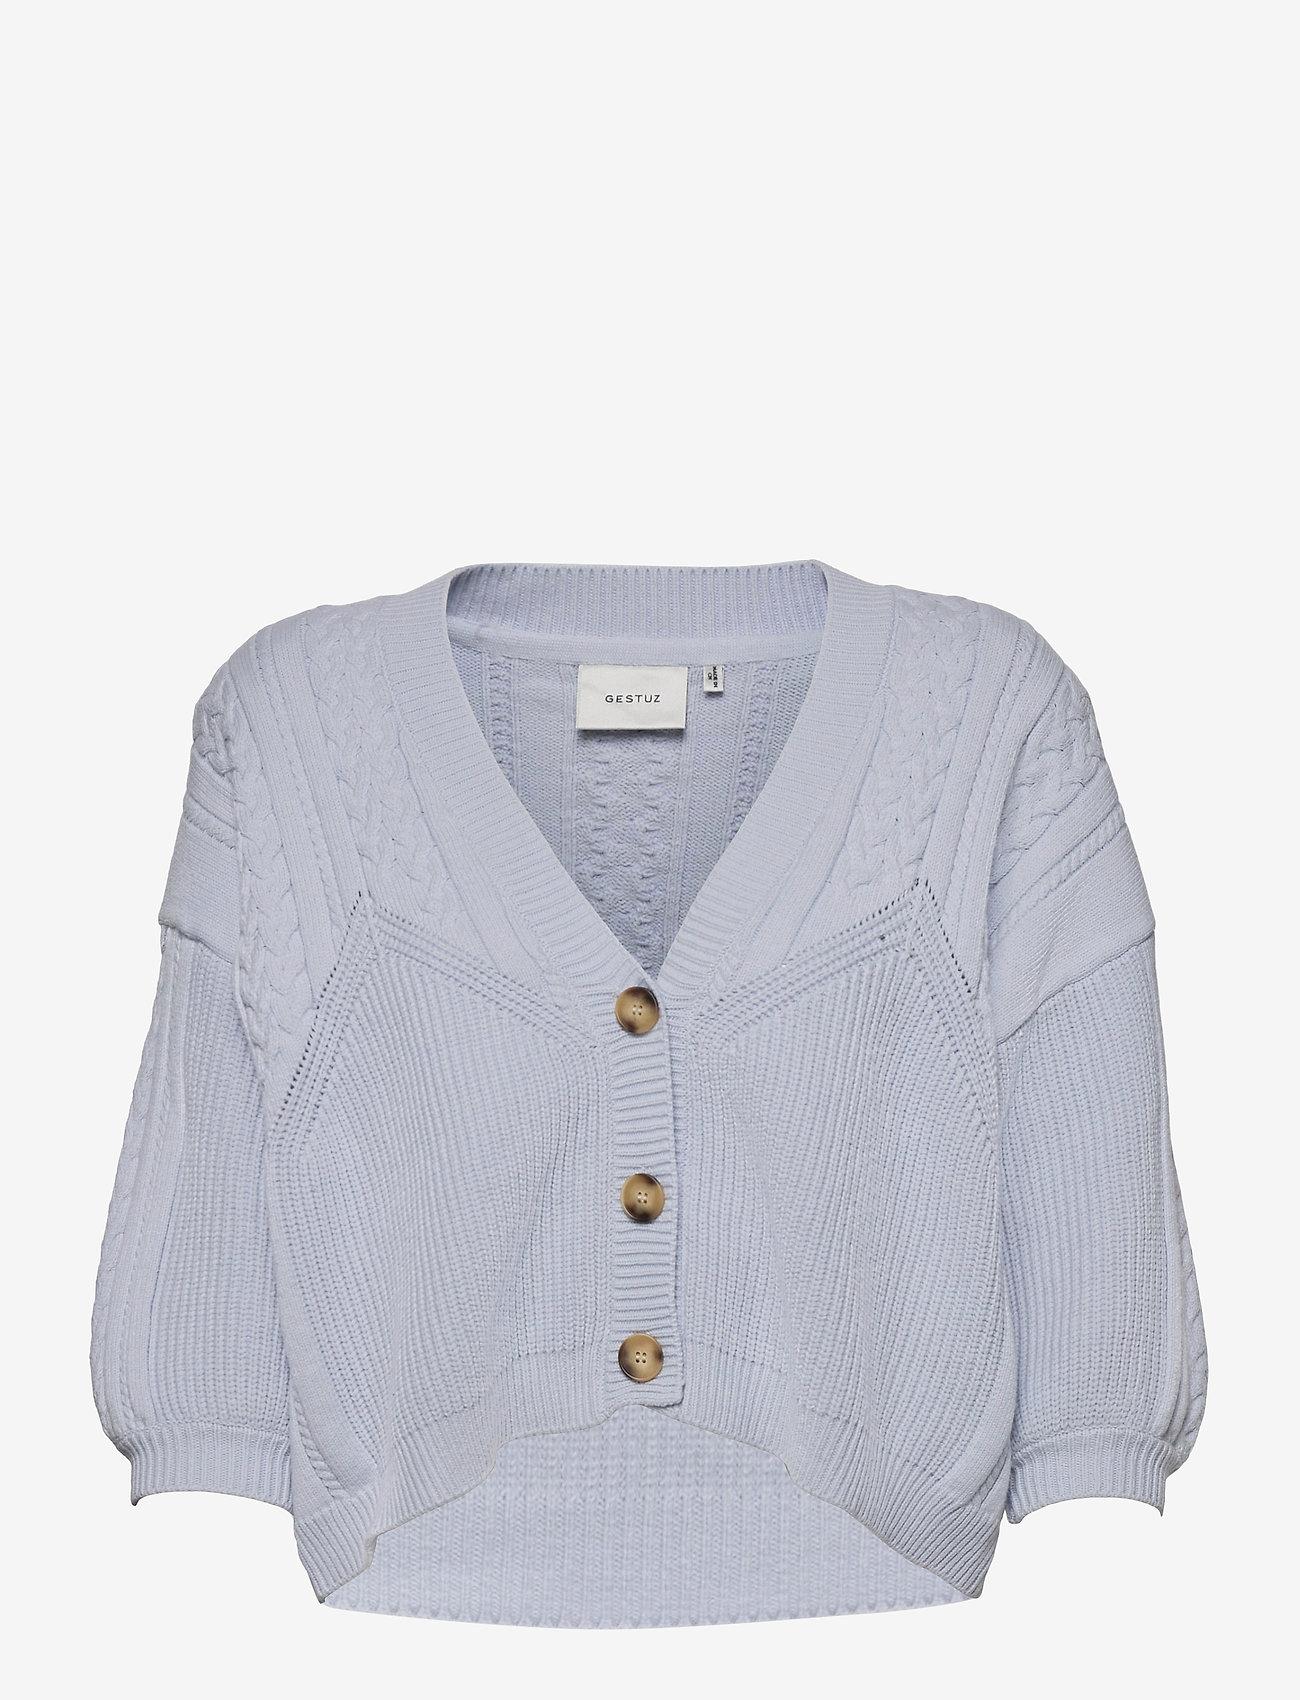 Gestuz - SoleyGZ cardigan - cardigans - xenon blue - 1